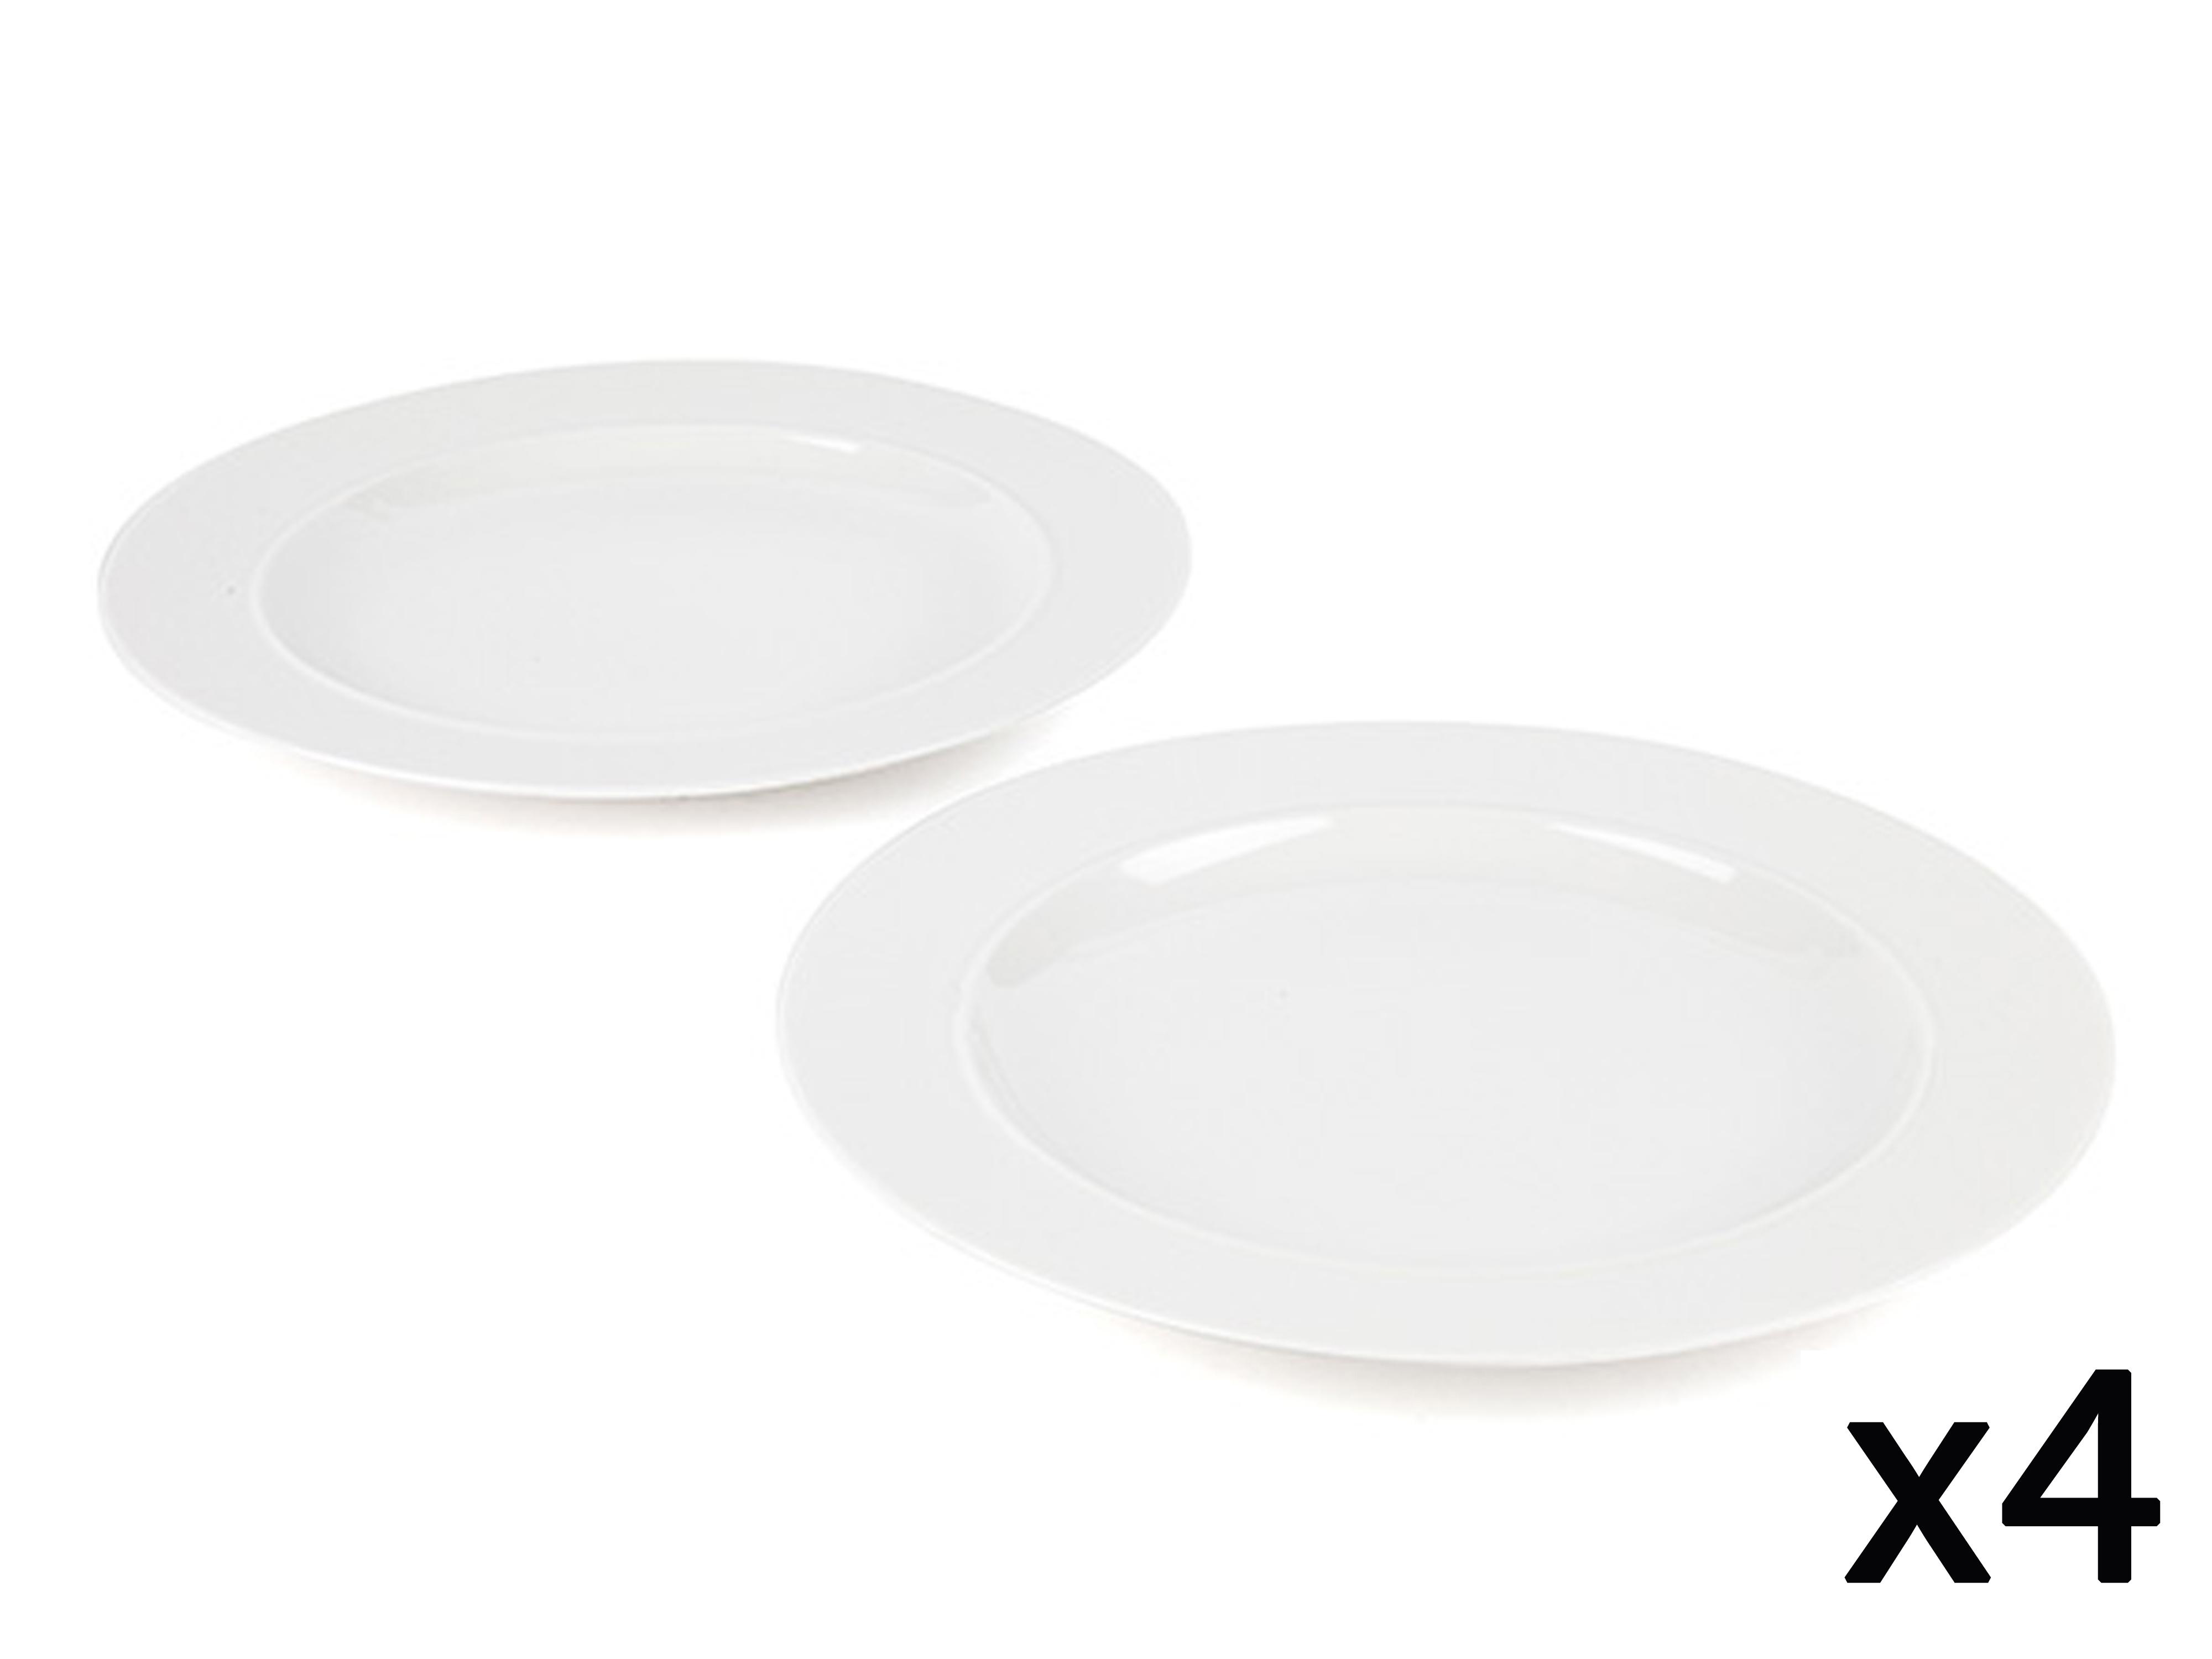 Alessi La Bella Tavola Porcelain Dinner Plates 27cm Set of 8  sc 1 st  No1Brands4You & Alessi La Bella Tavola Porcelain Dinner Plates 27cm Set of 8 ...